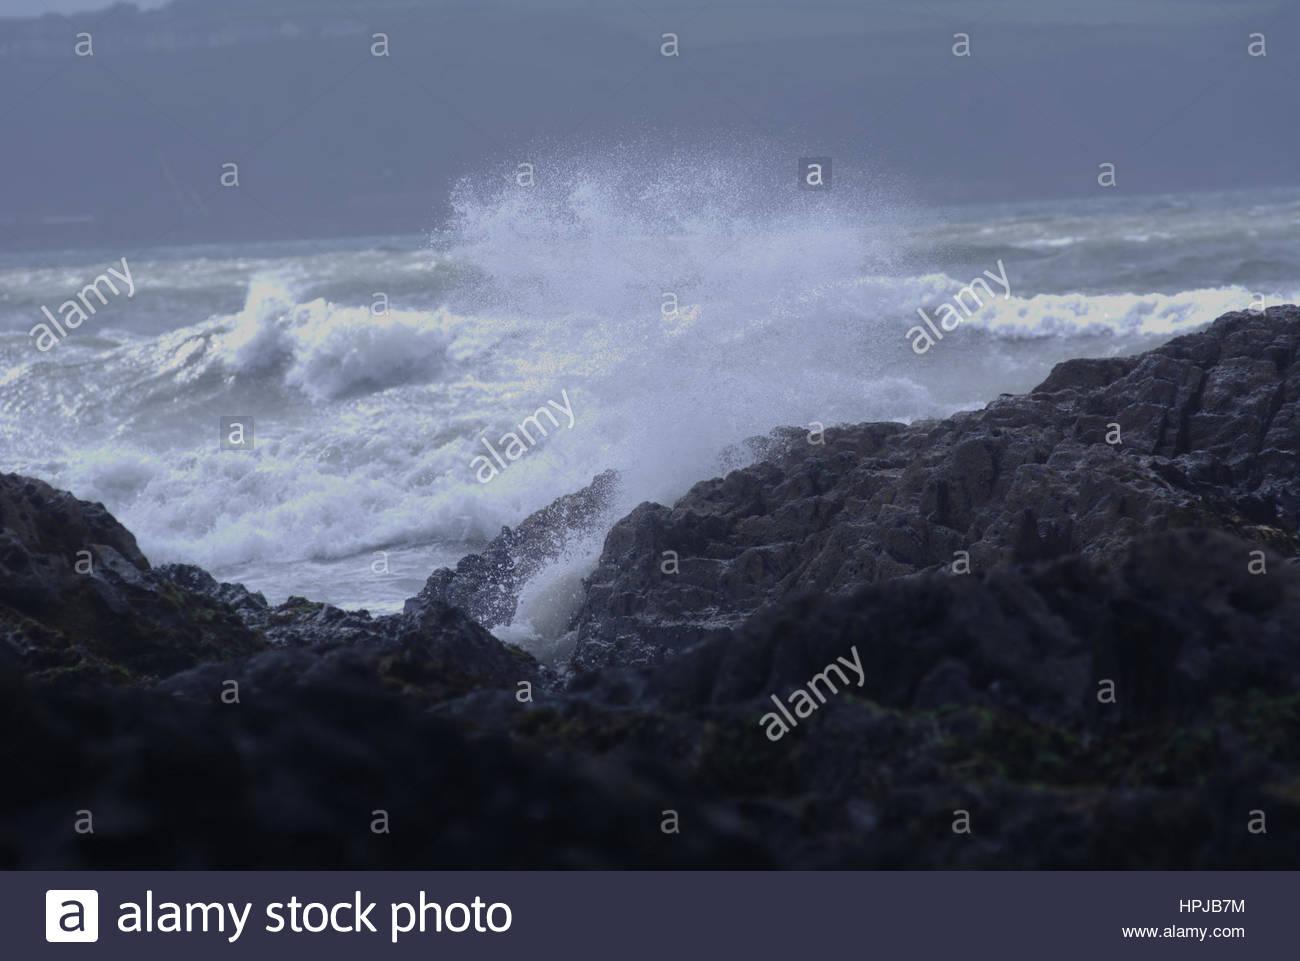 Coastal waves crashing into rocks during a storm - Stock Image